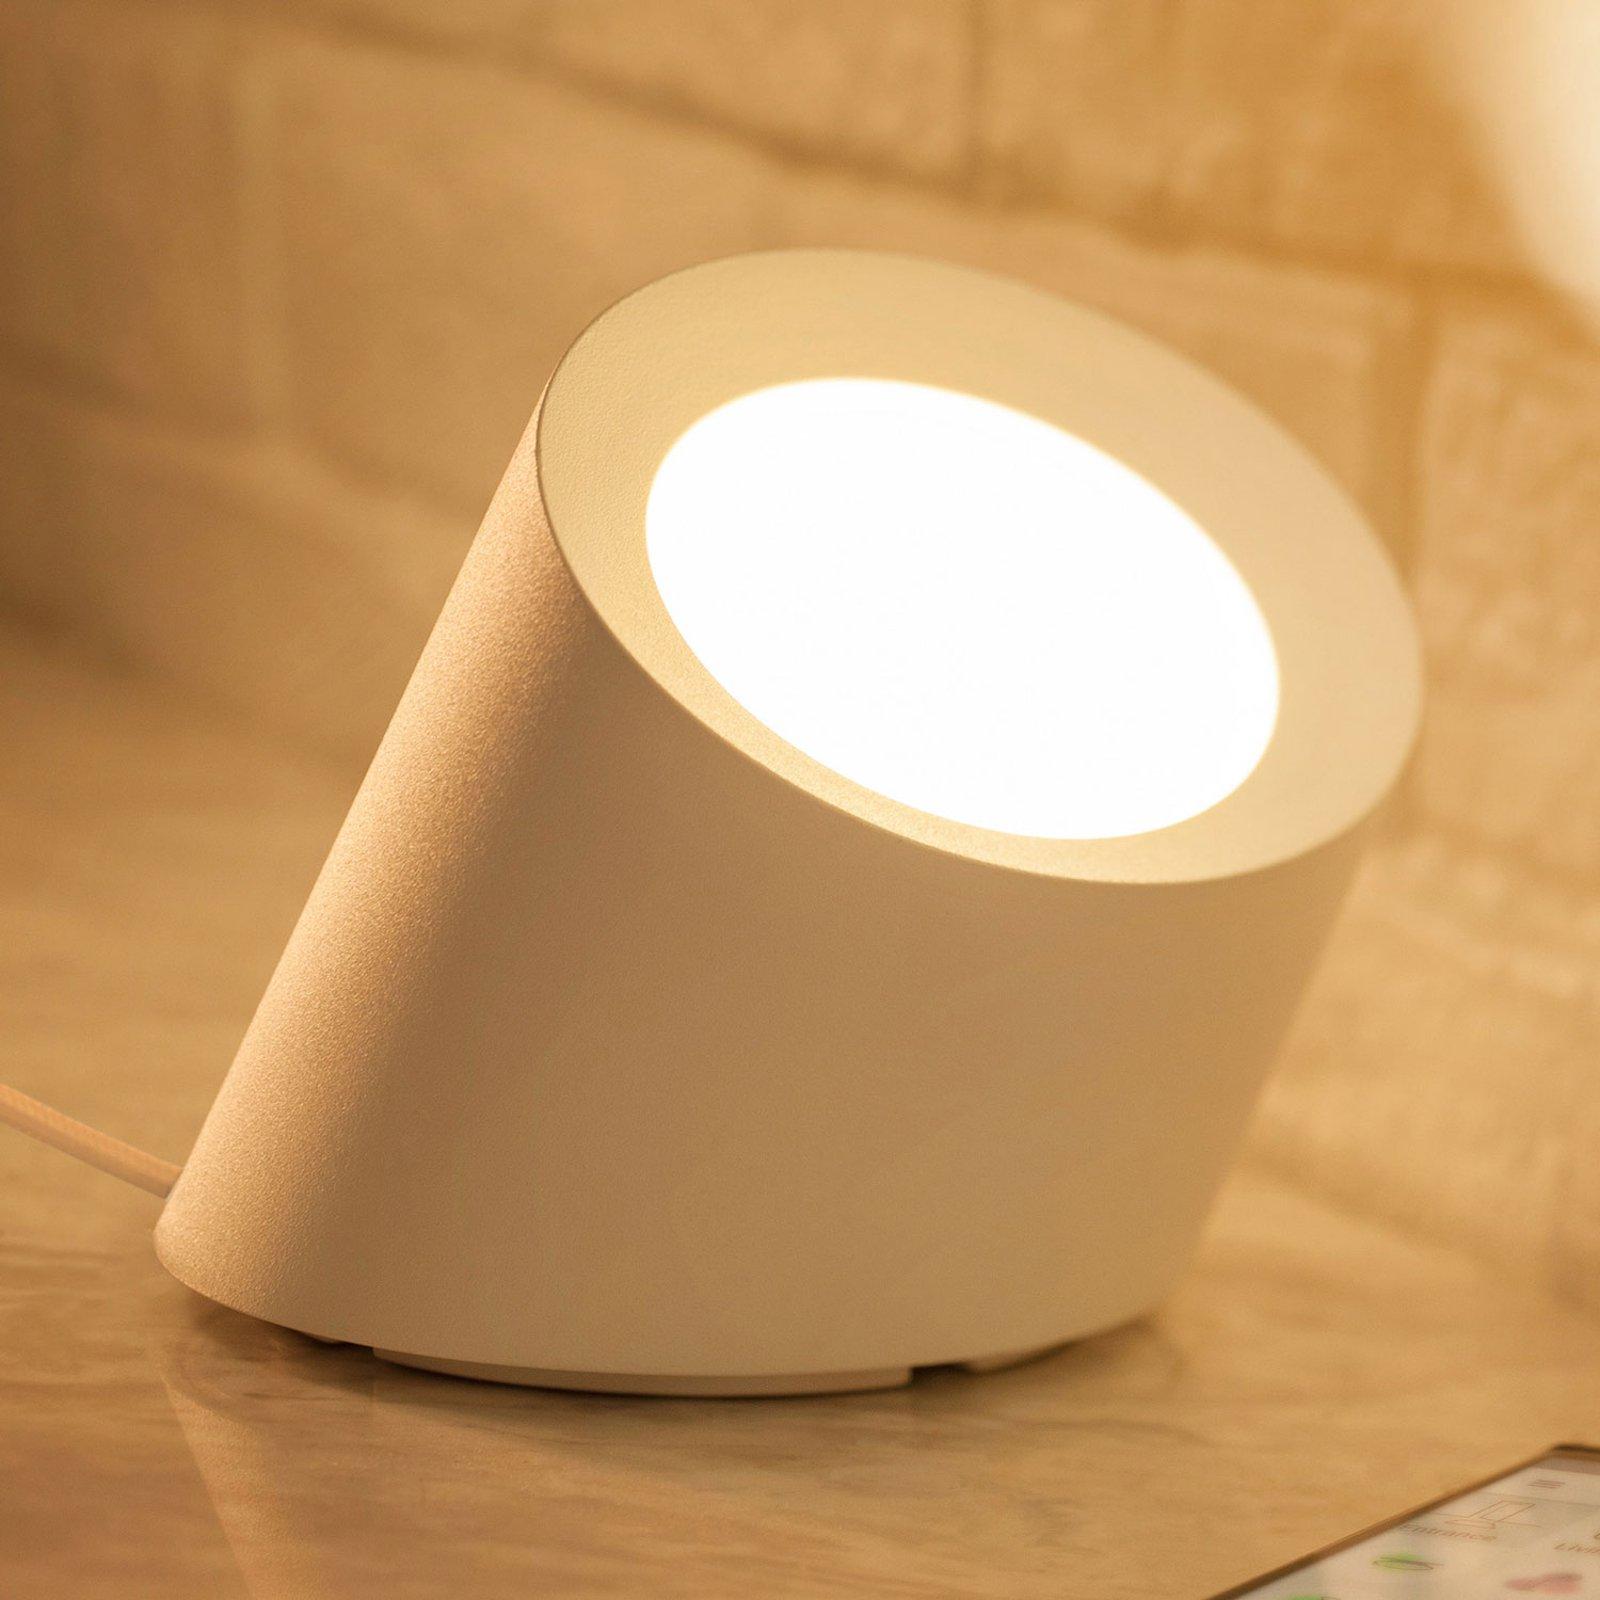 WiZ Graal LED-bordlampe RGBW 2200-6500 K